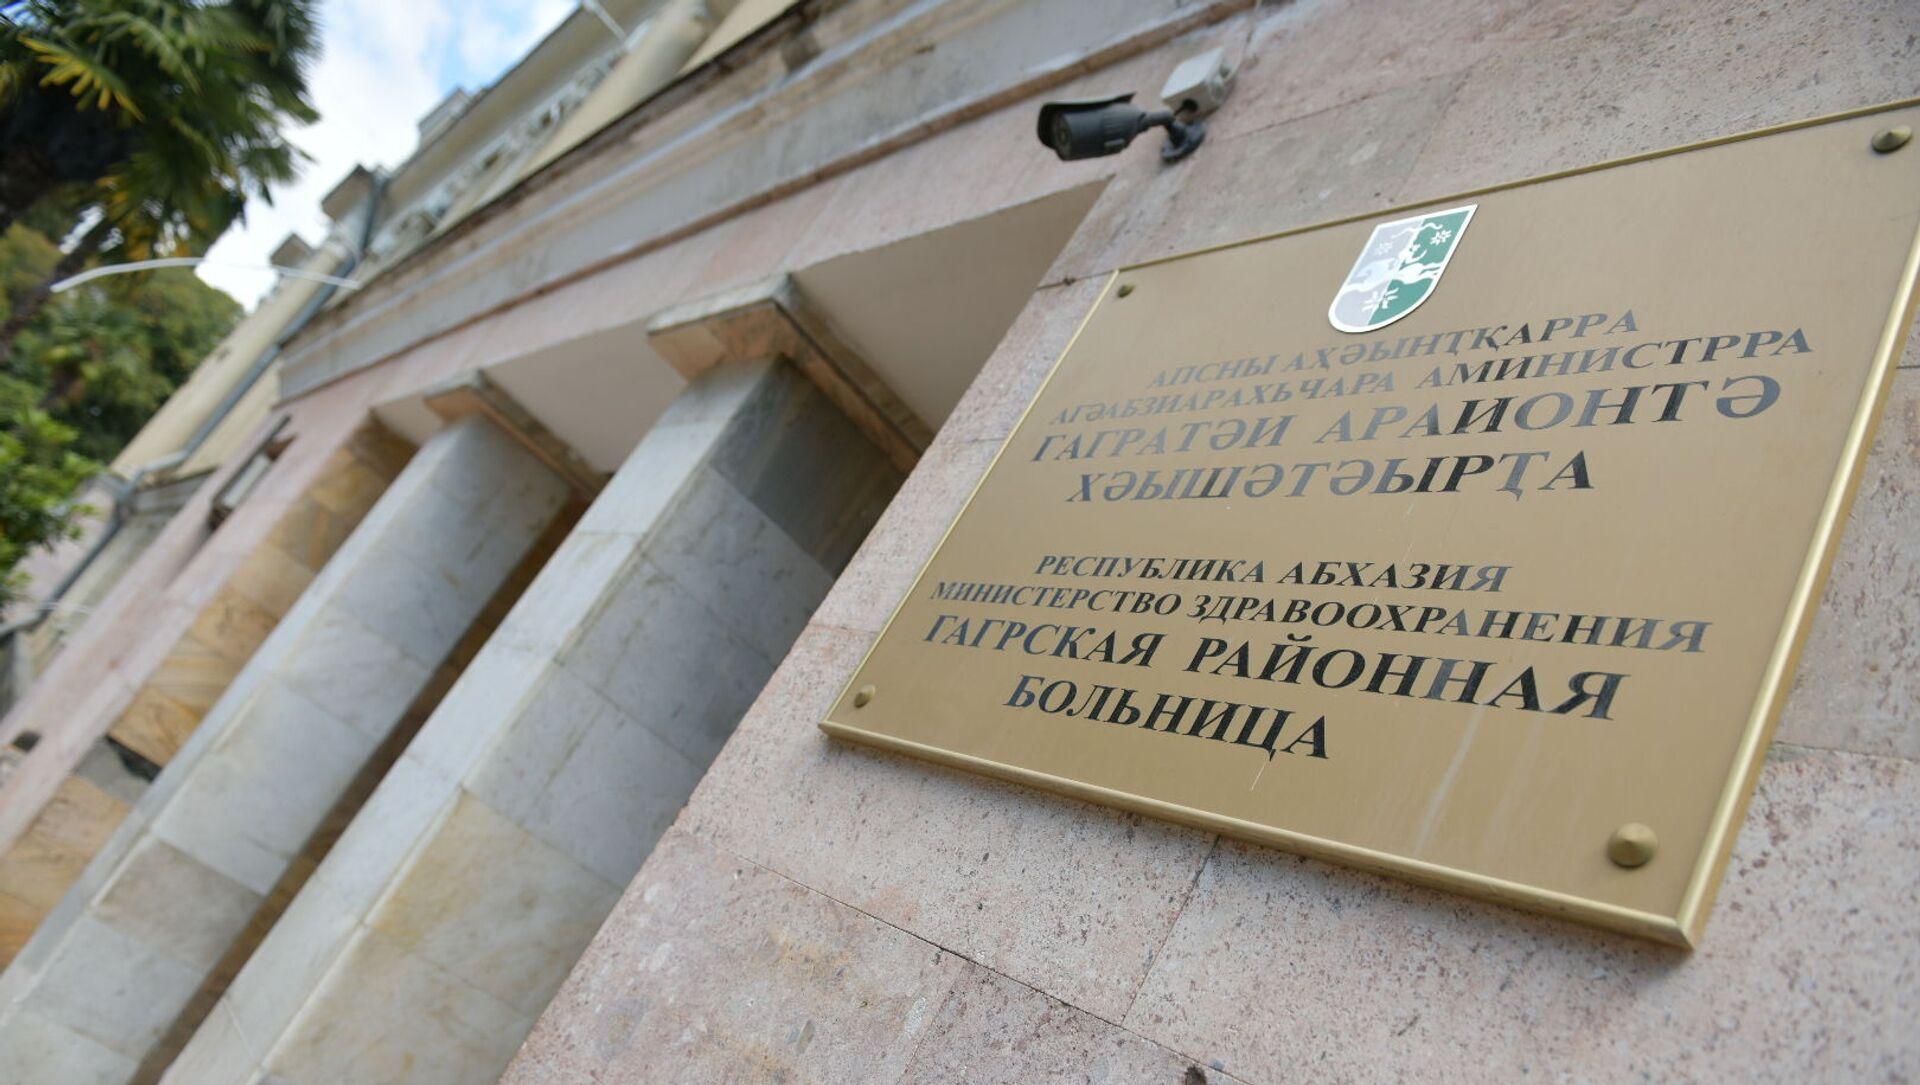 Гагрская районная больница  - Sputnik Абхазия, 1920, 09.09.2021